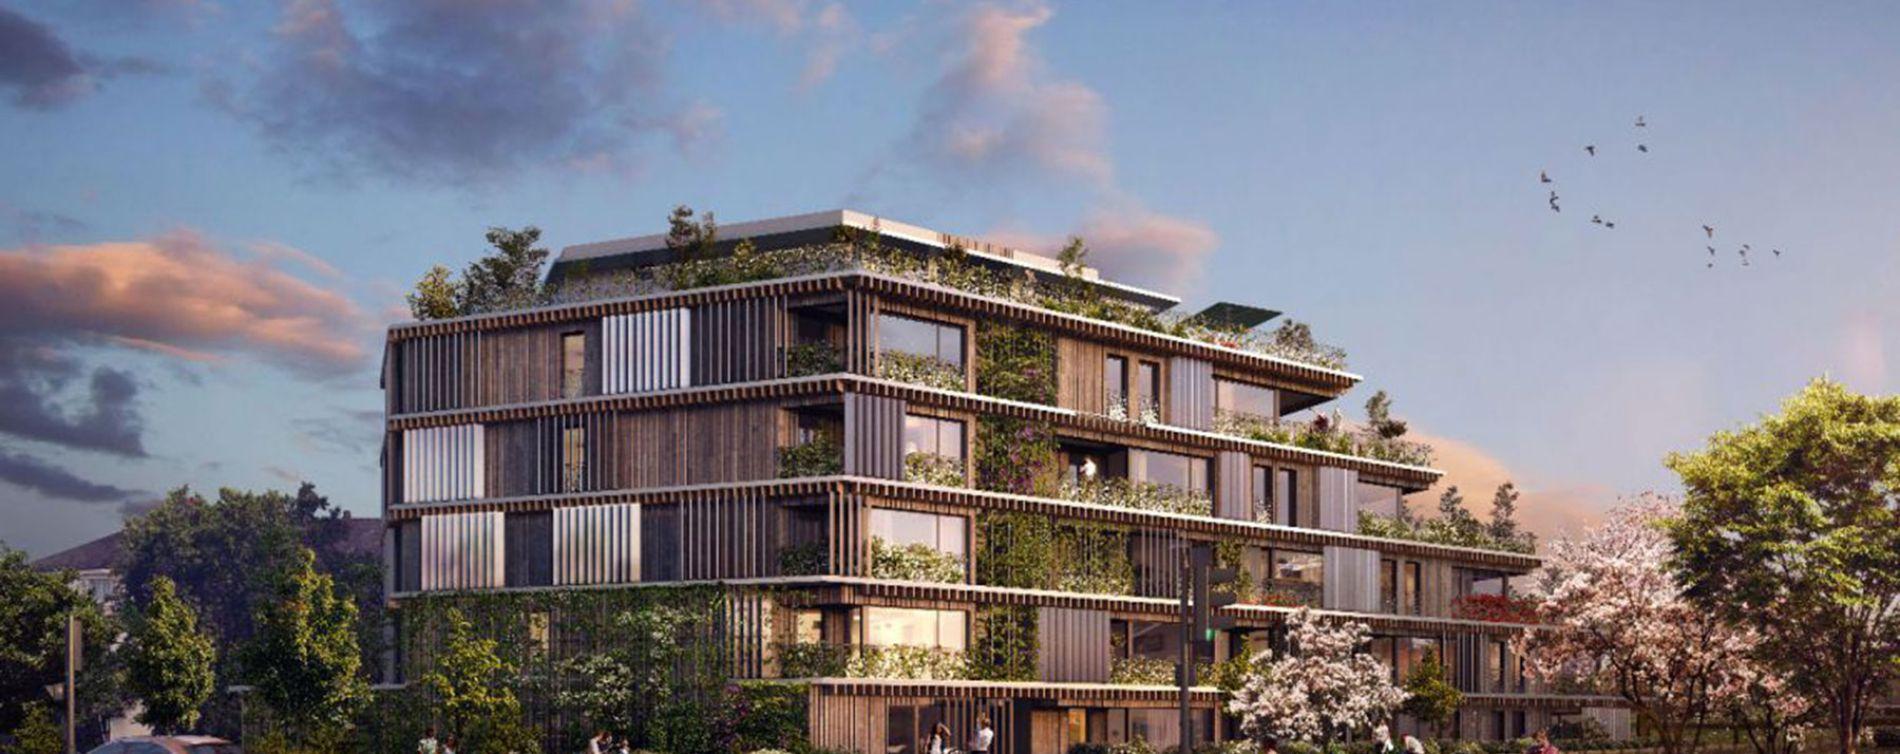 Chambray-lès-Tours : programme immobilier neuve « Odyssée » en Loi Pinel